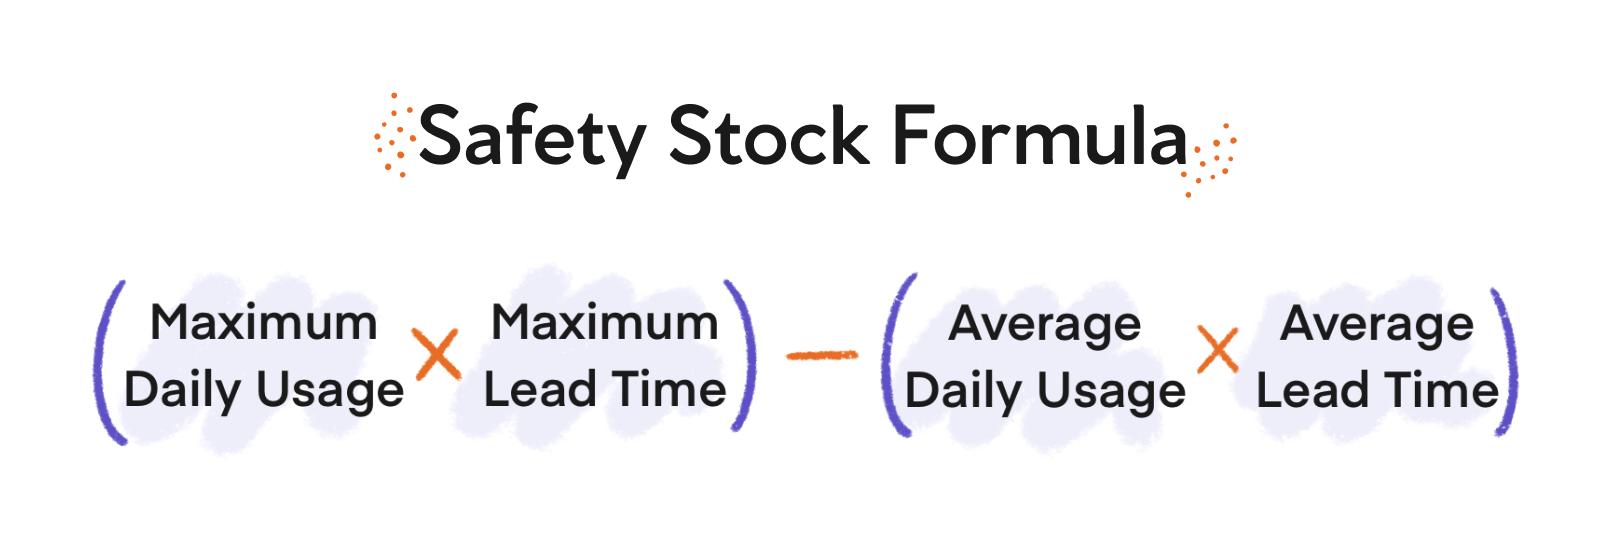 safety stock formula